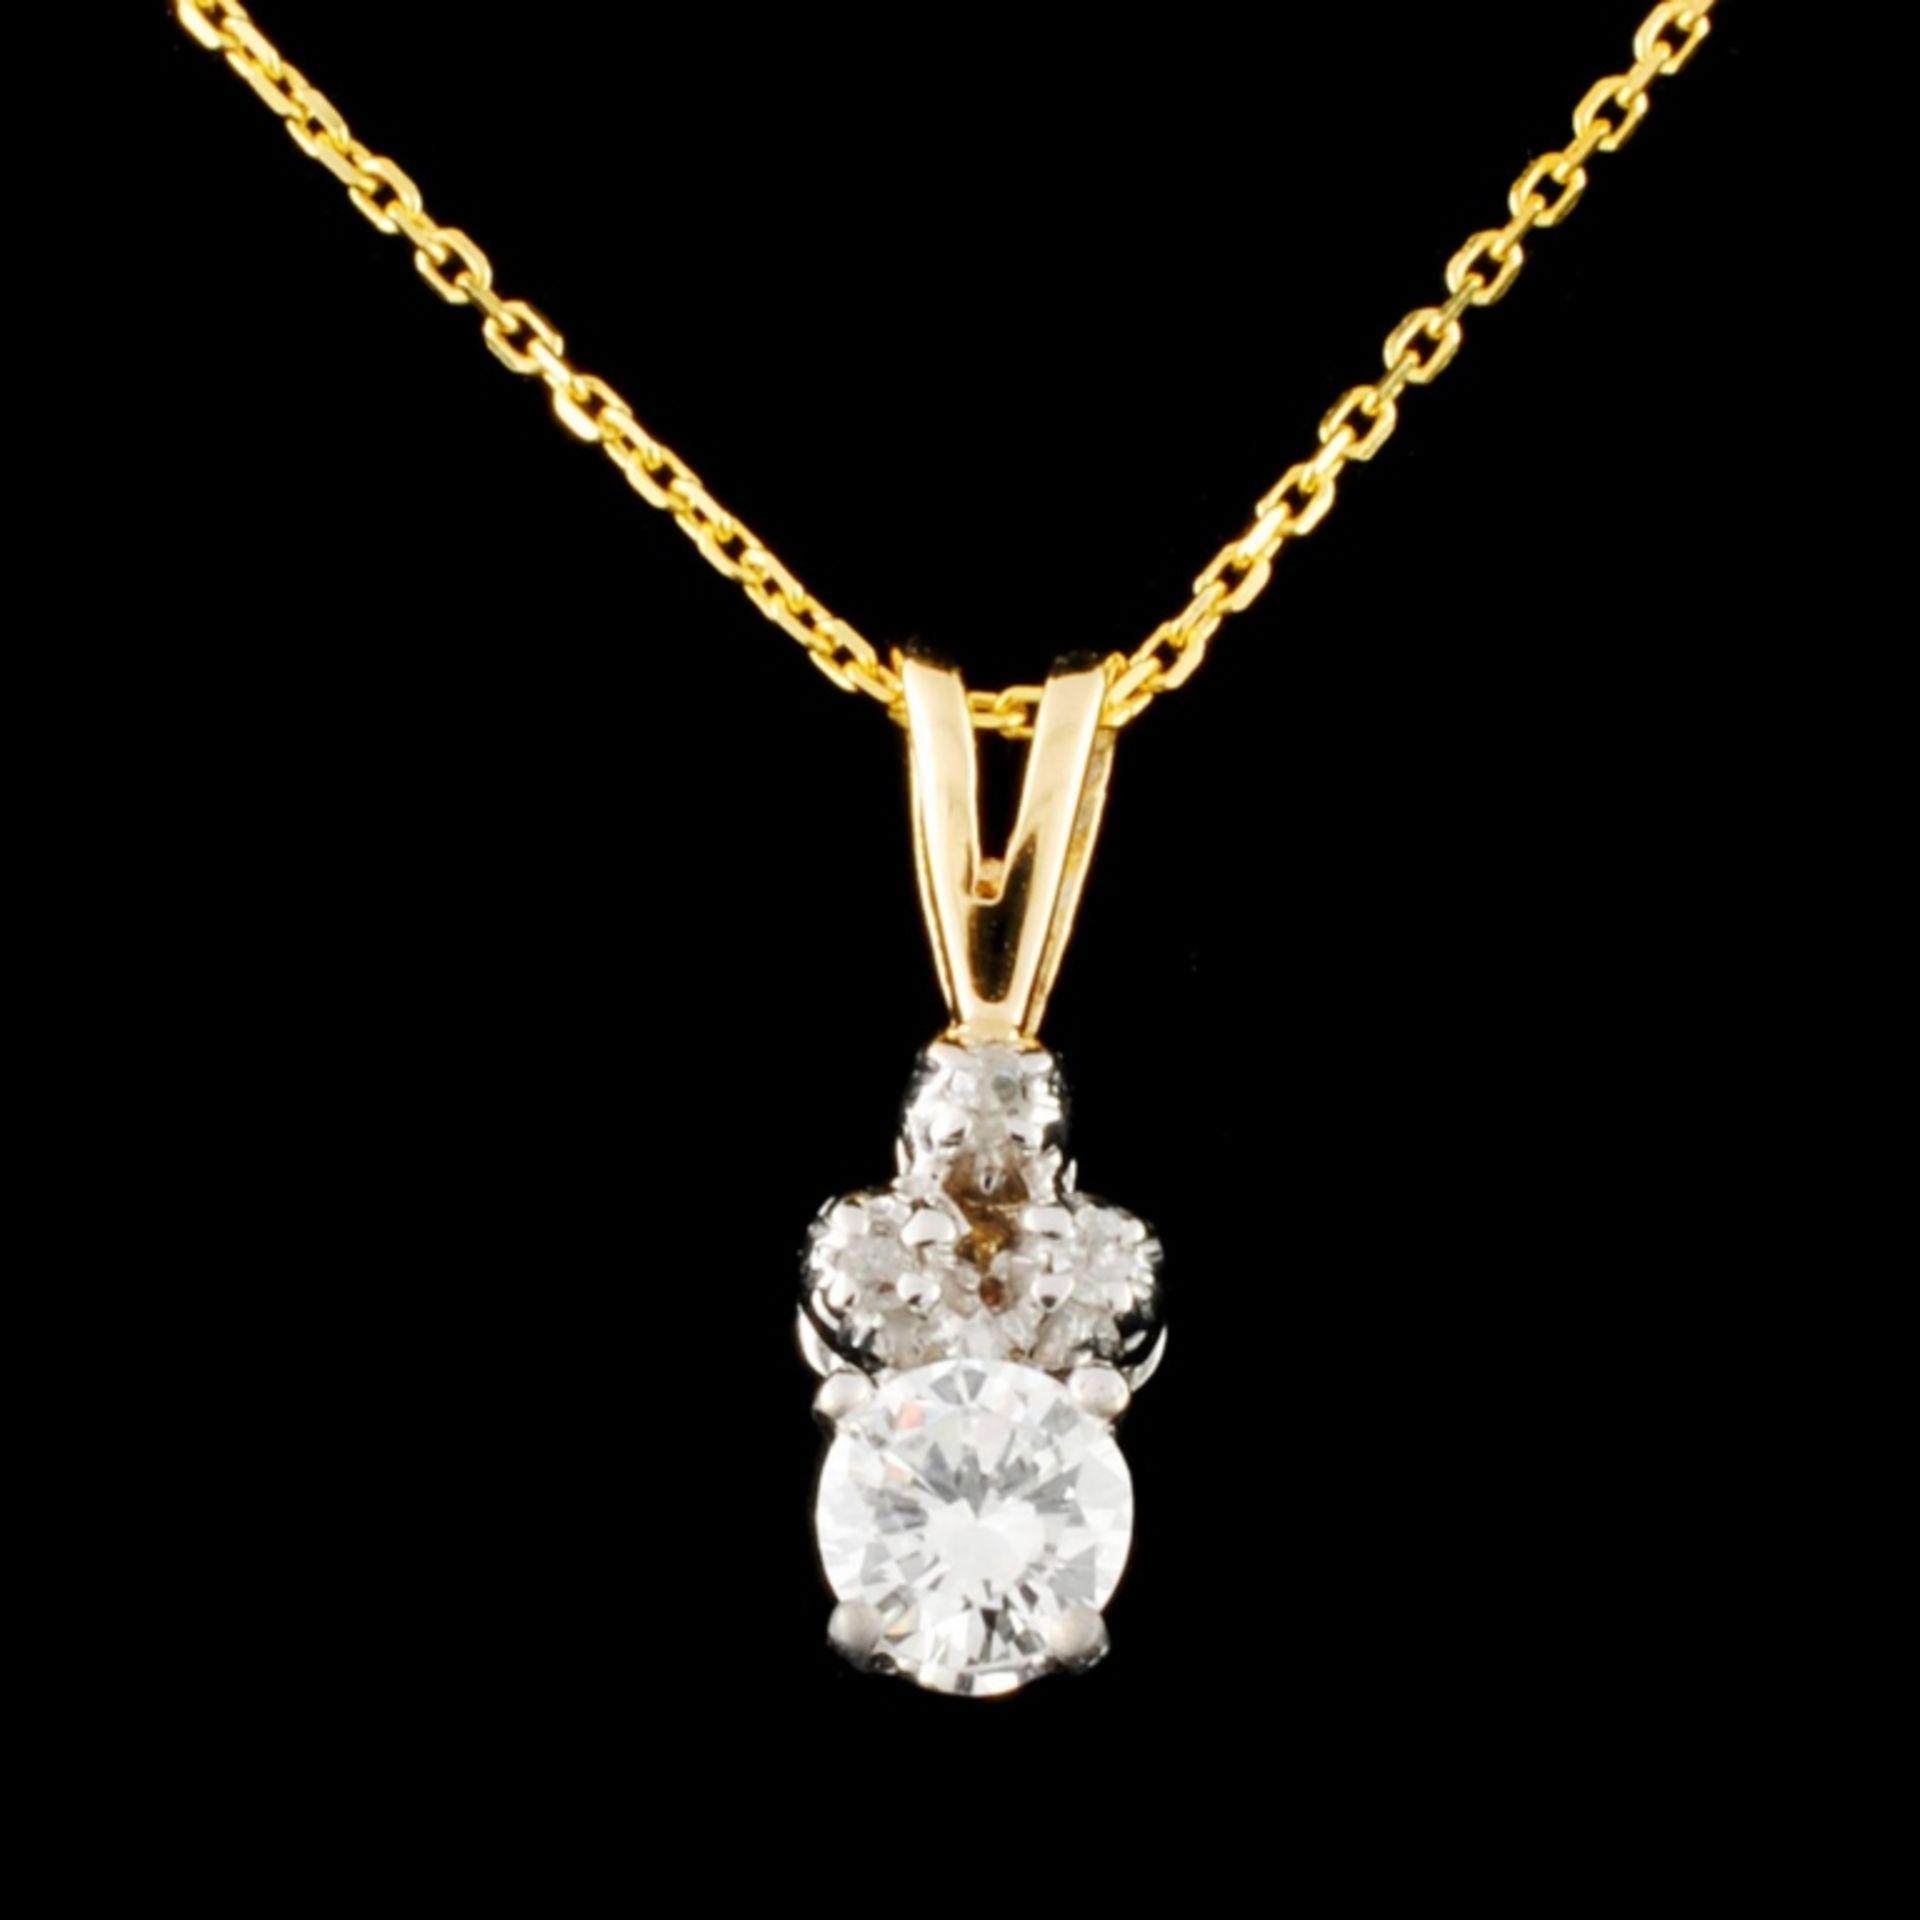 14K Gold 0.26ctw Diamond Pendant - Image 2 of 4